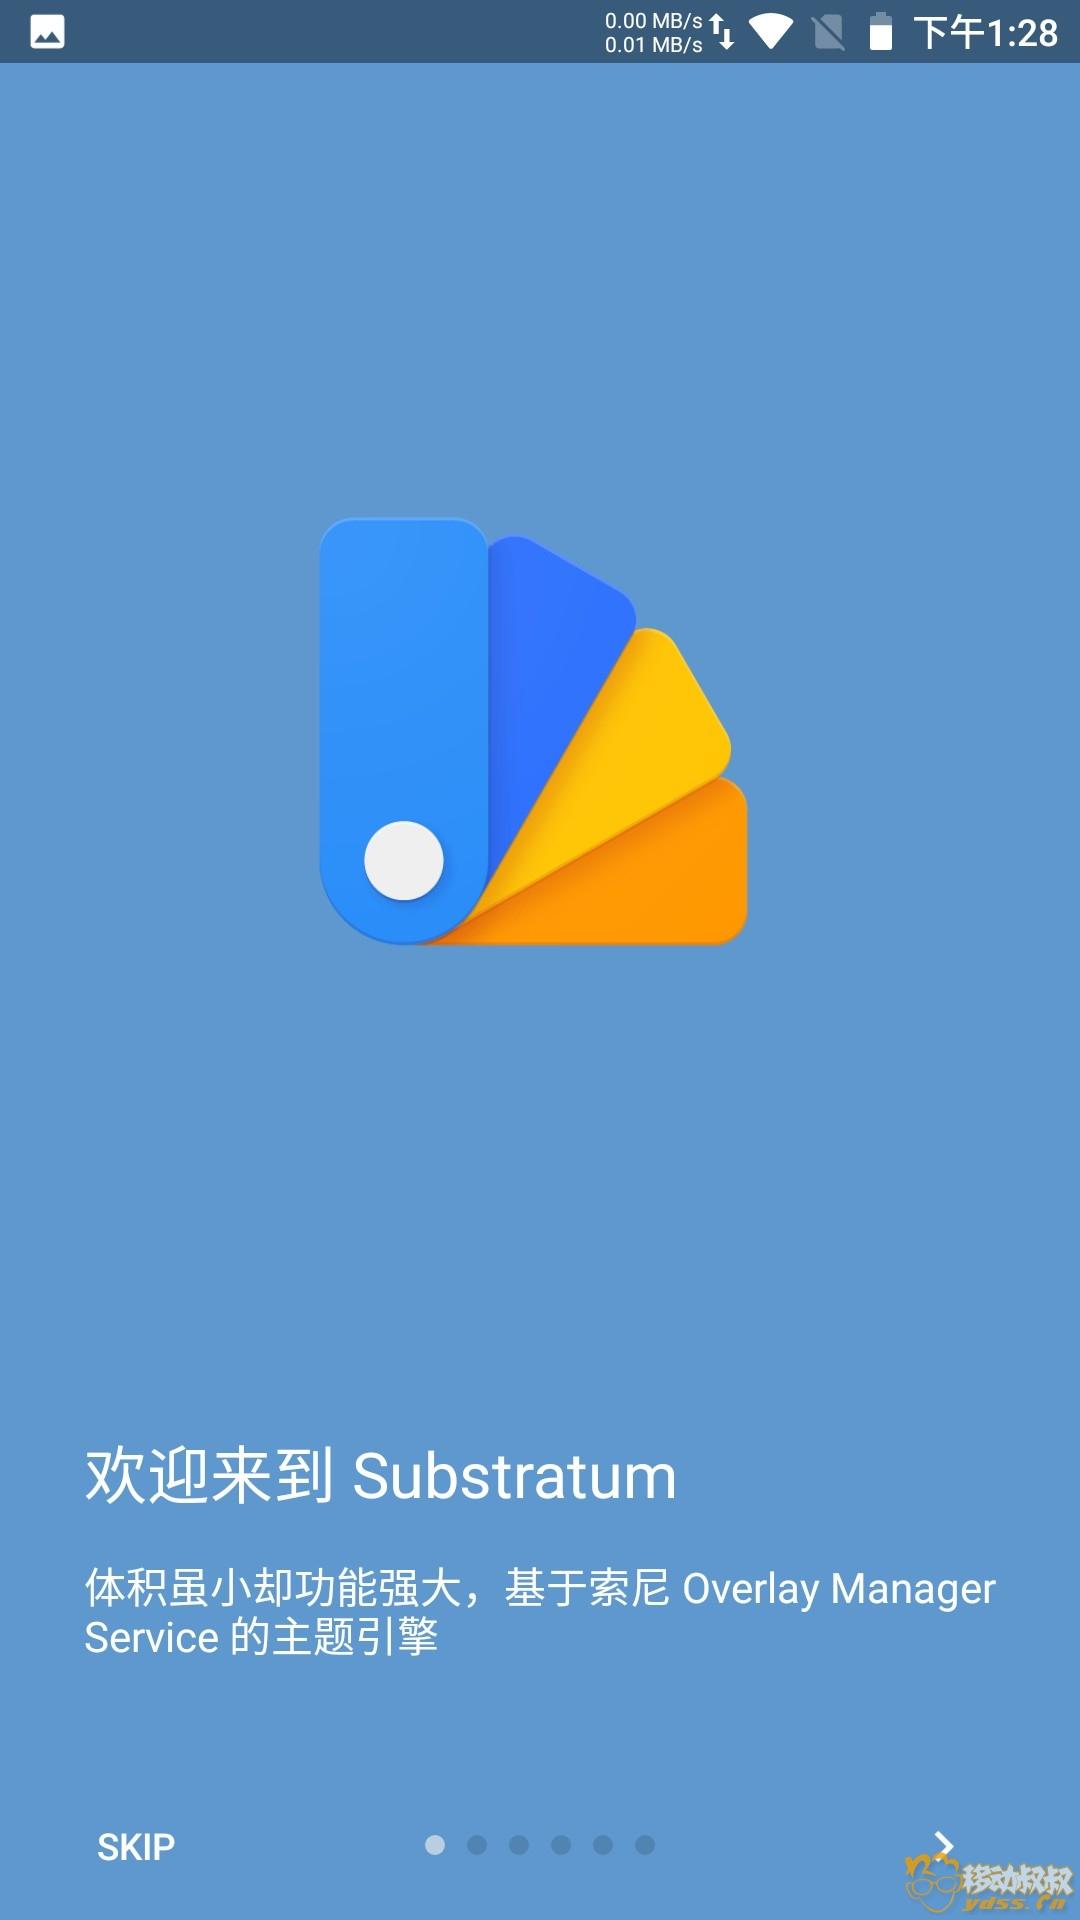 New0020Screenshot_substratum_20180913-132836.jpg